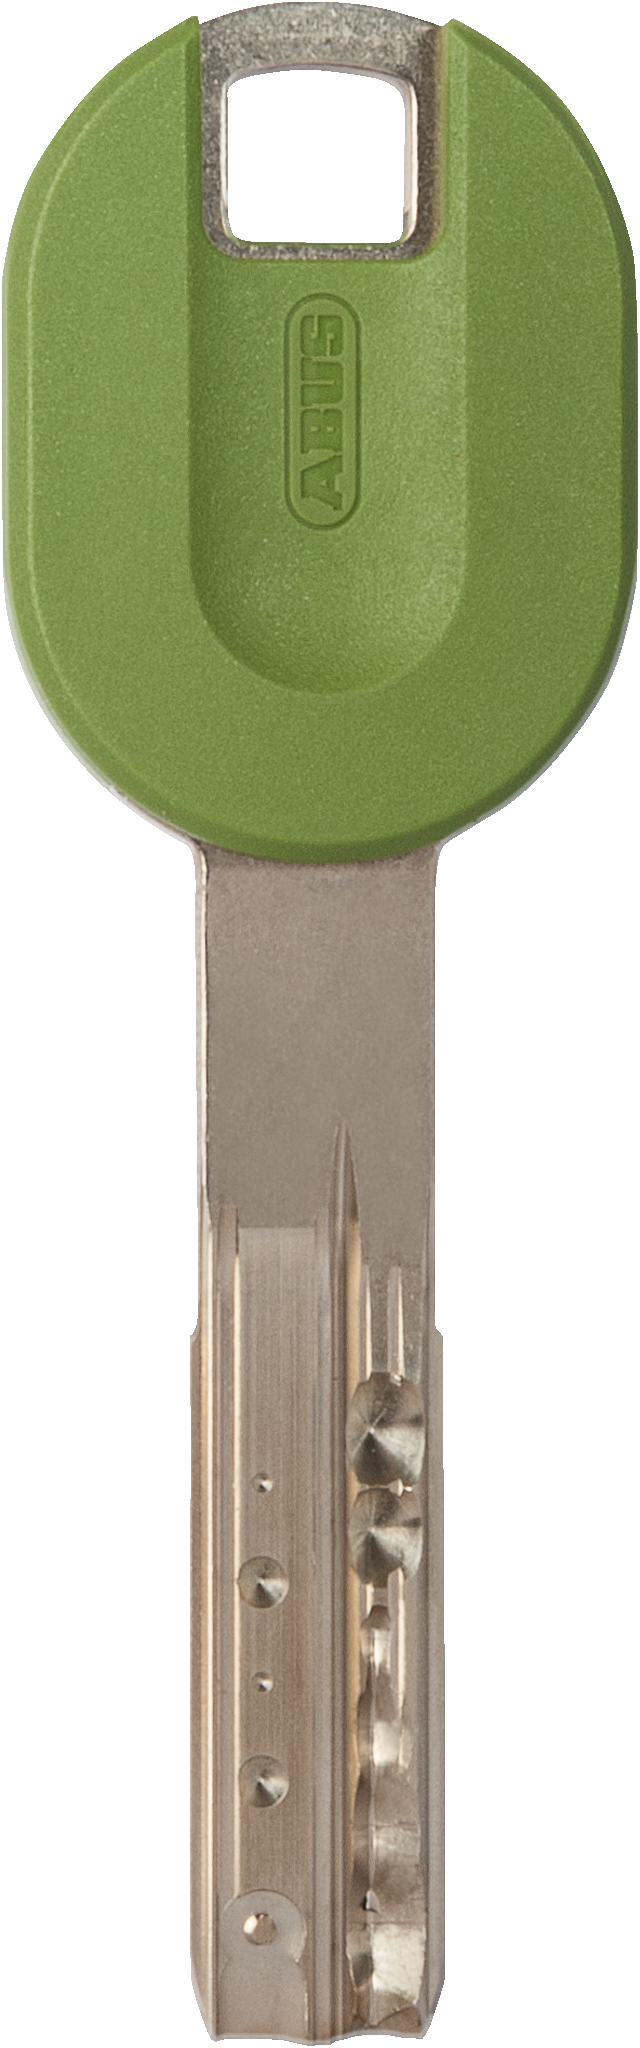 Schlüsselkappe Pro Cap grün